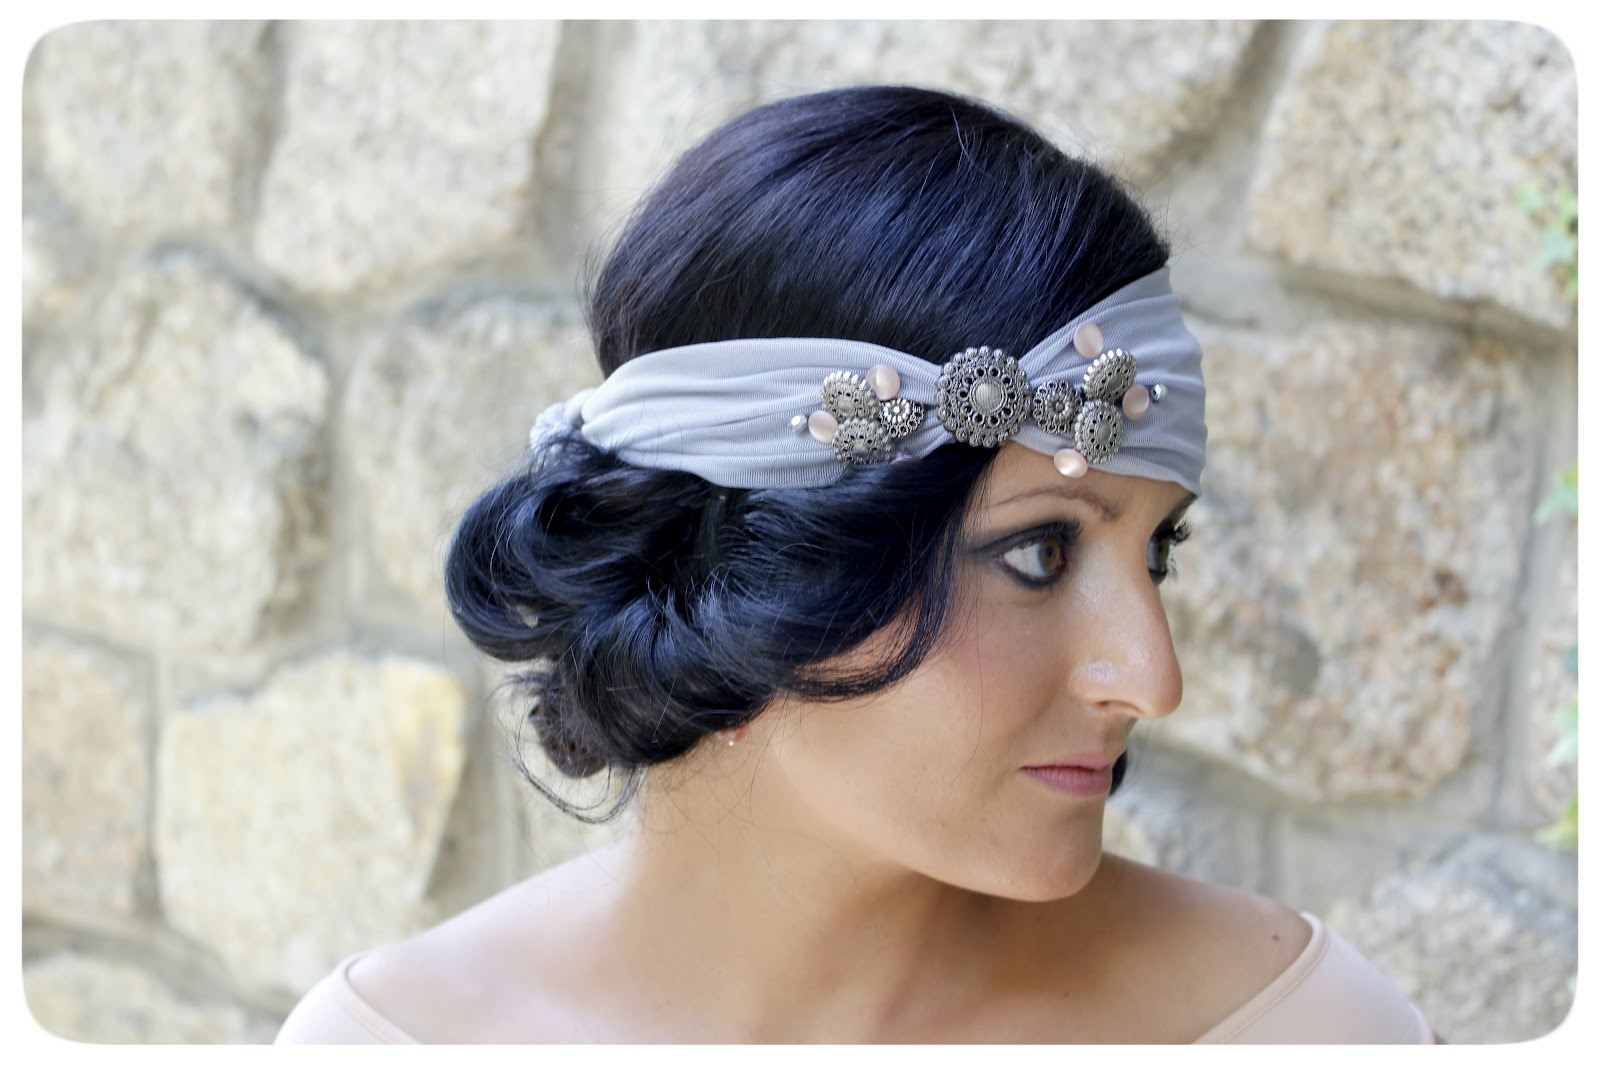 Hermanas bolena outfit de boda tocado a os 20 segunda parte - Como hacer peinado para boda ...